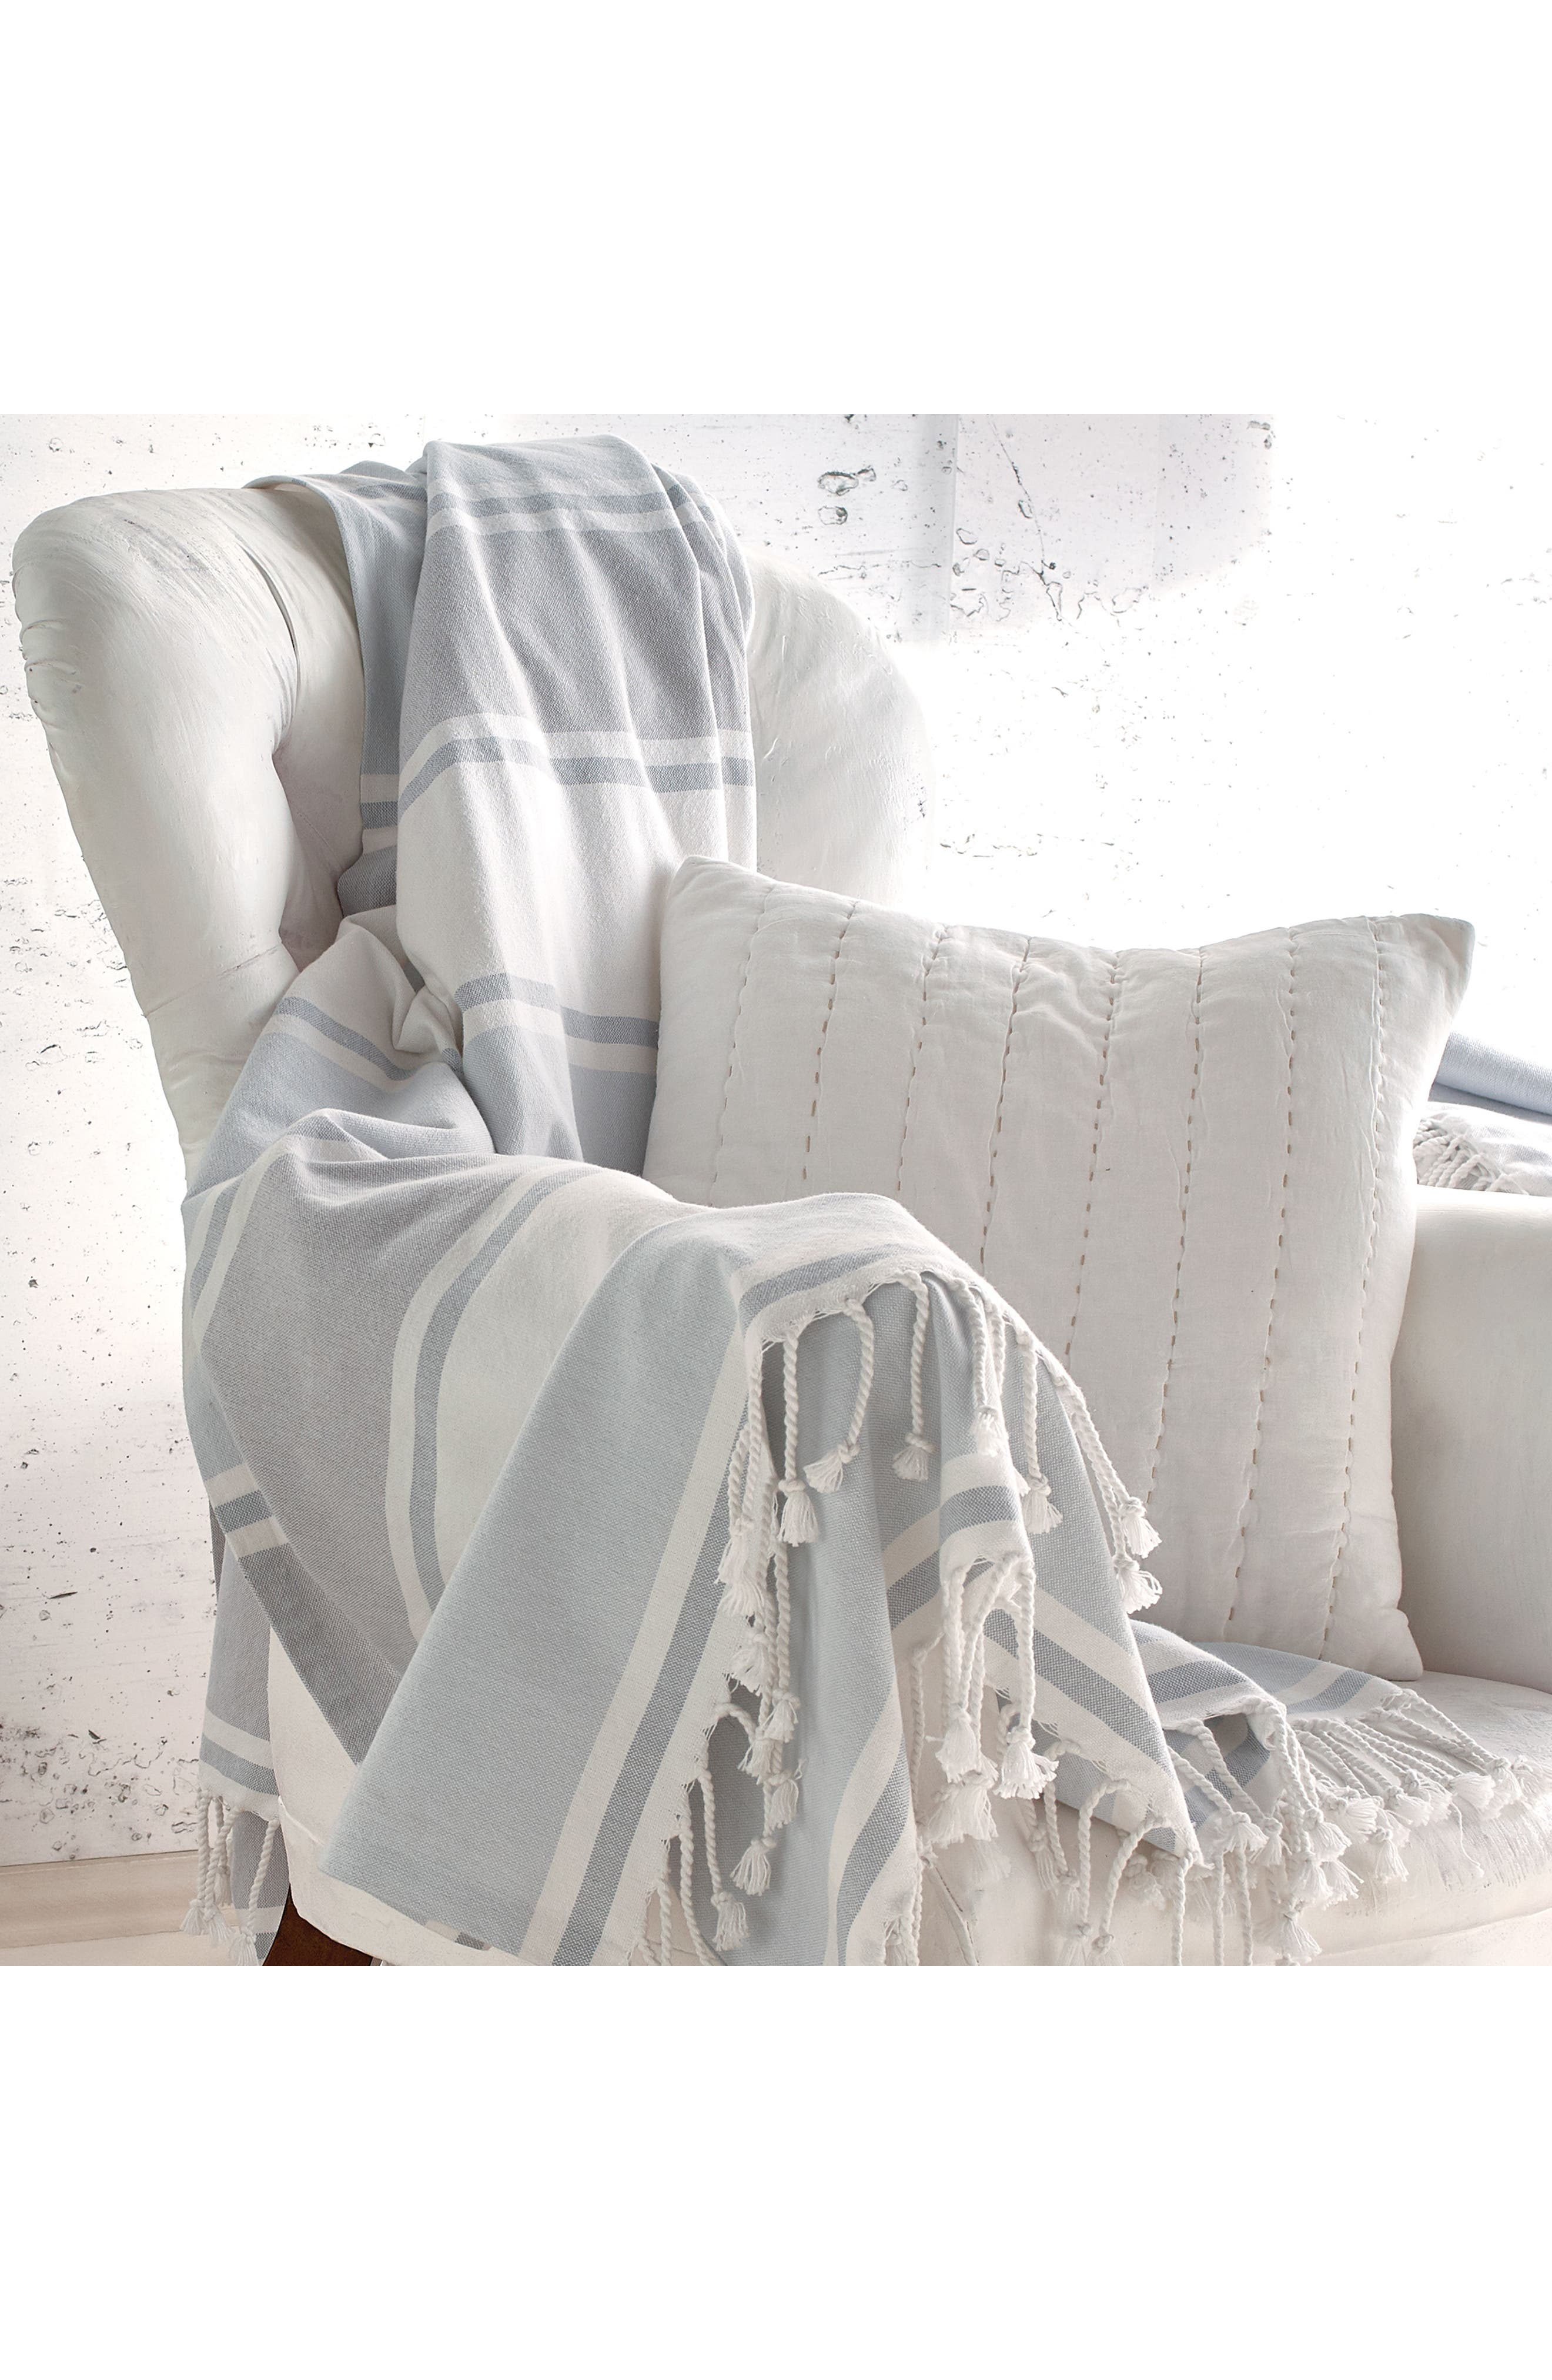 DKNY, Donna Karan New York Pure Stripe Blanket, Alternate thumbnail 4, color, BLUE